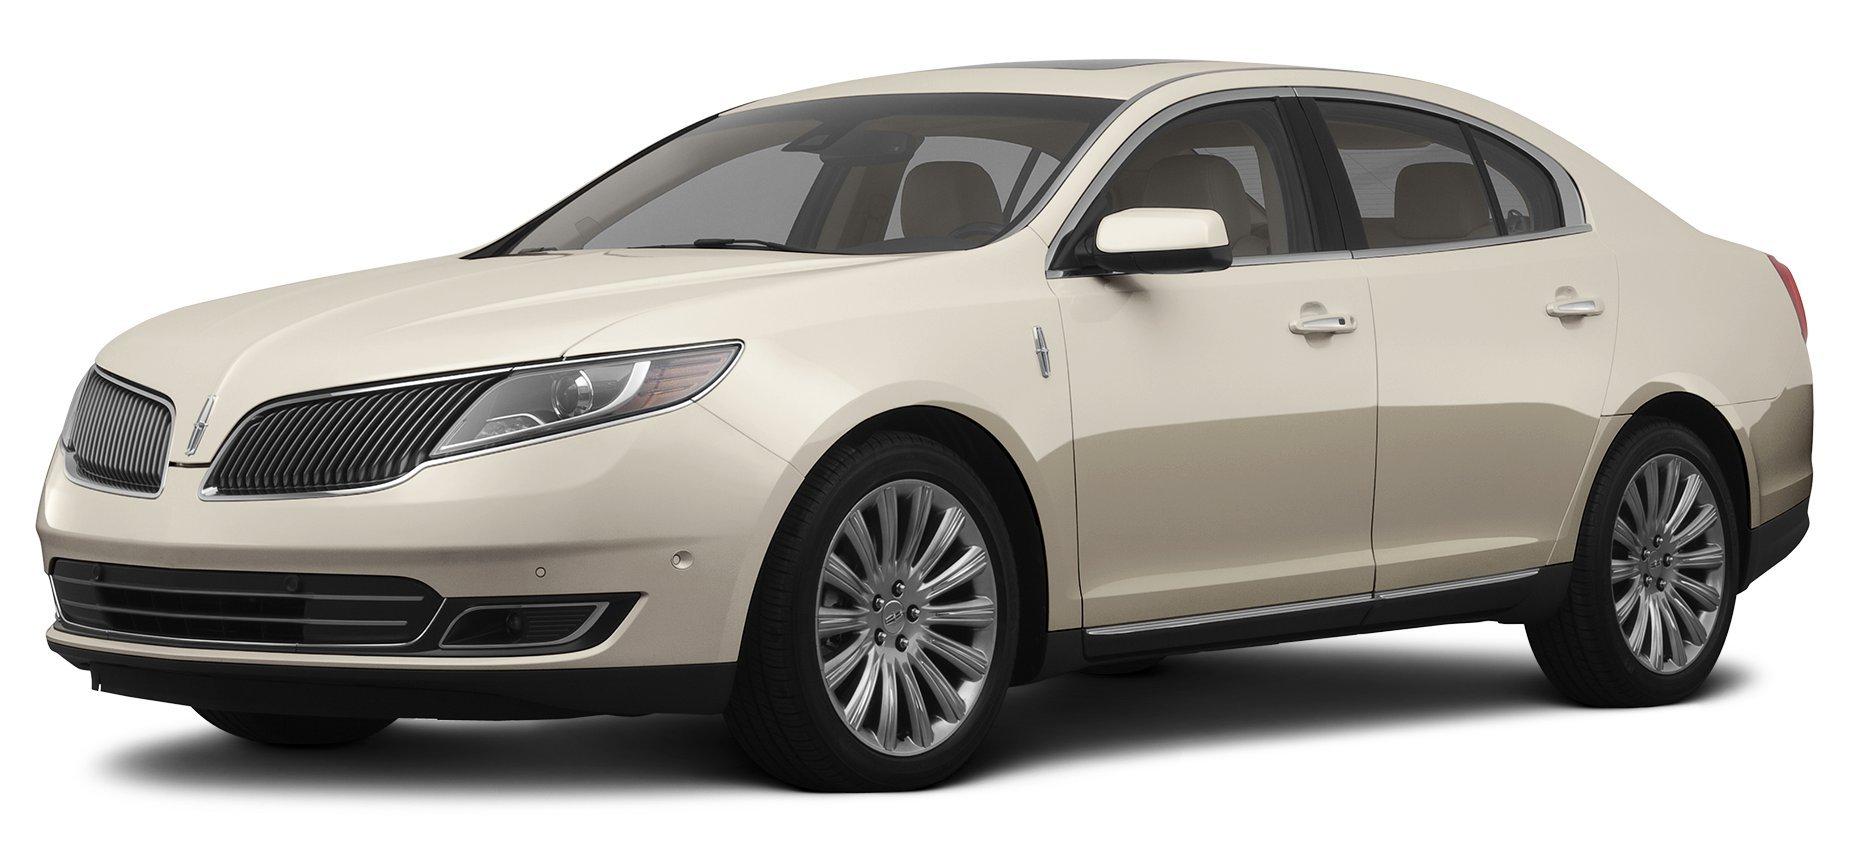 ... 2013 Lincoln MKS, 4-Door Sedan 3.7L All Wheel Drive ...